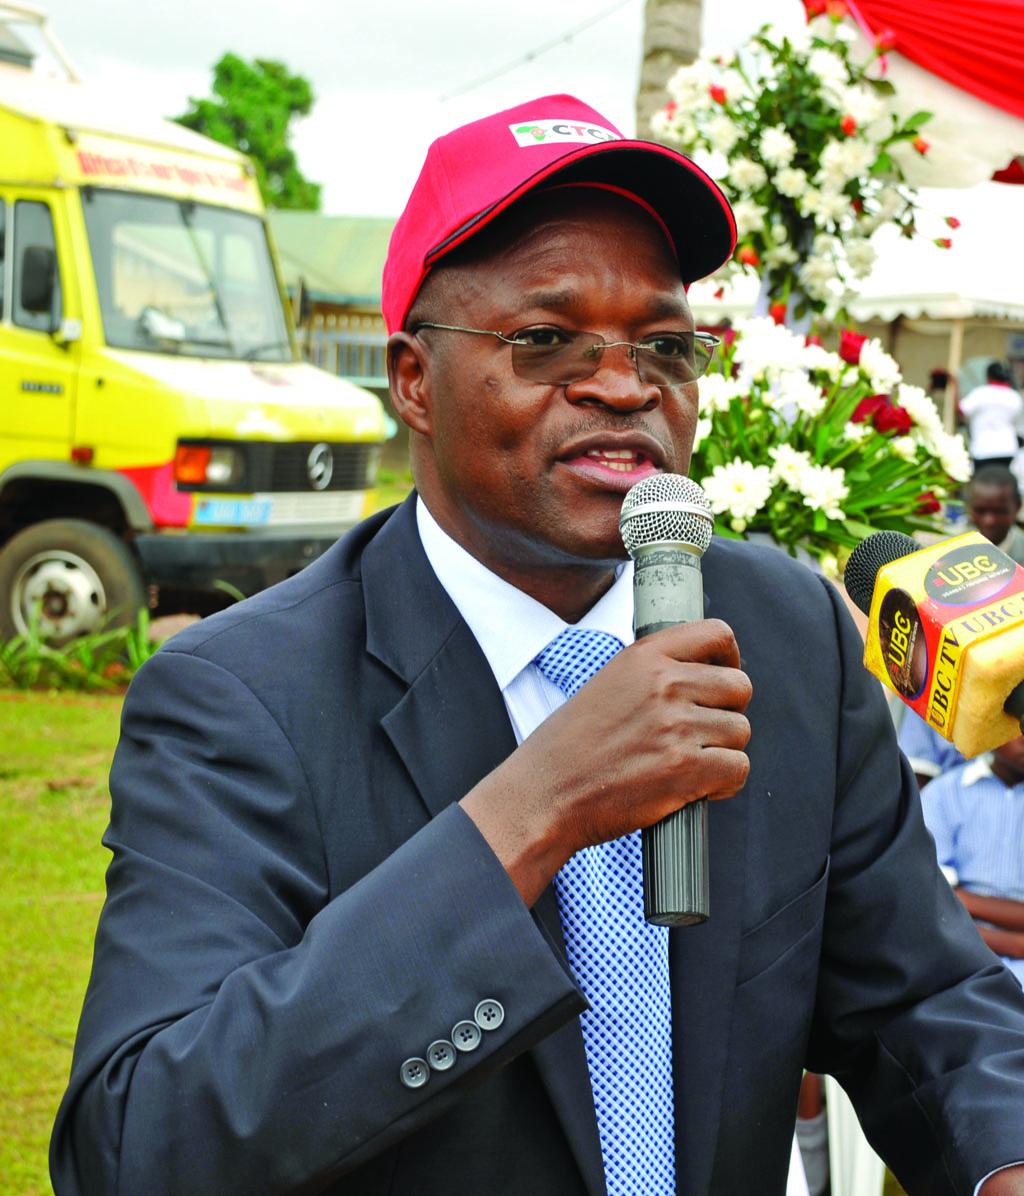 IMHL - Dr. Possy Mugyenyi